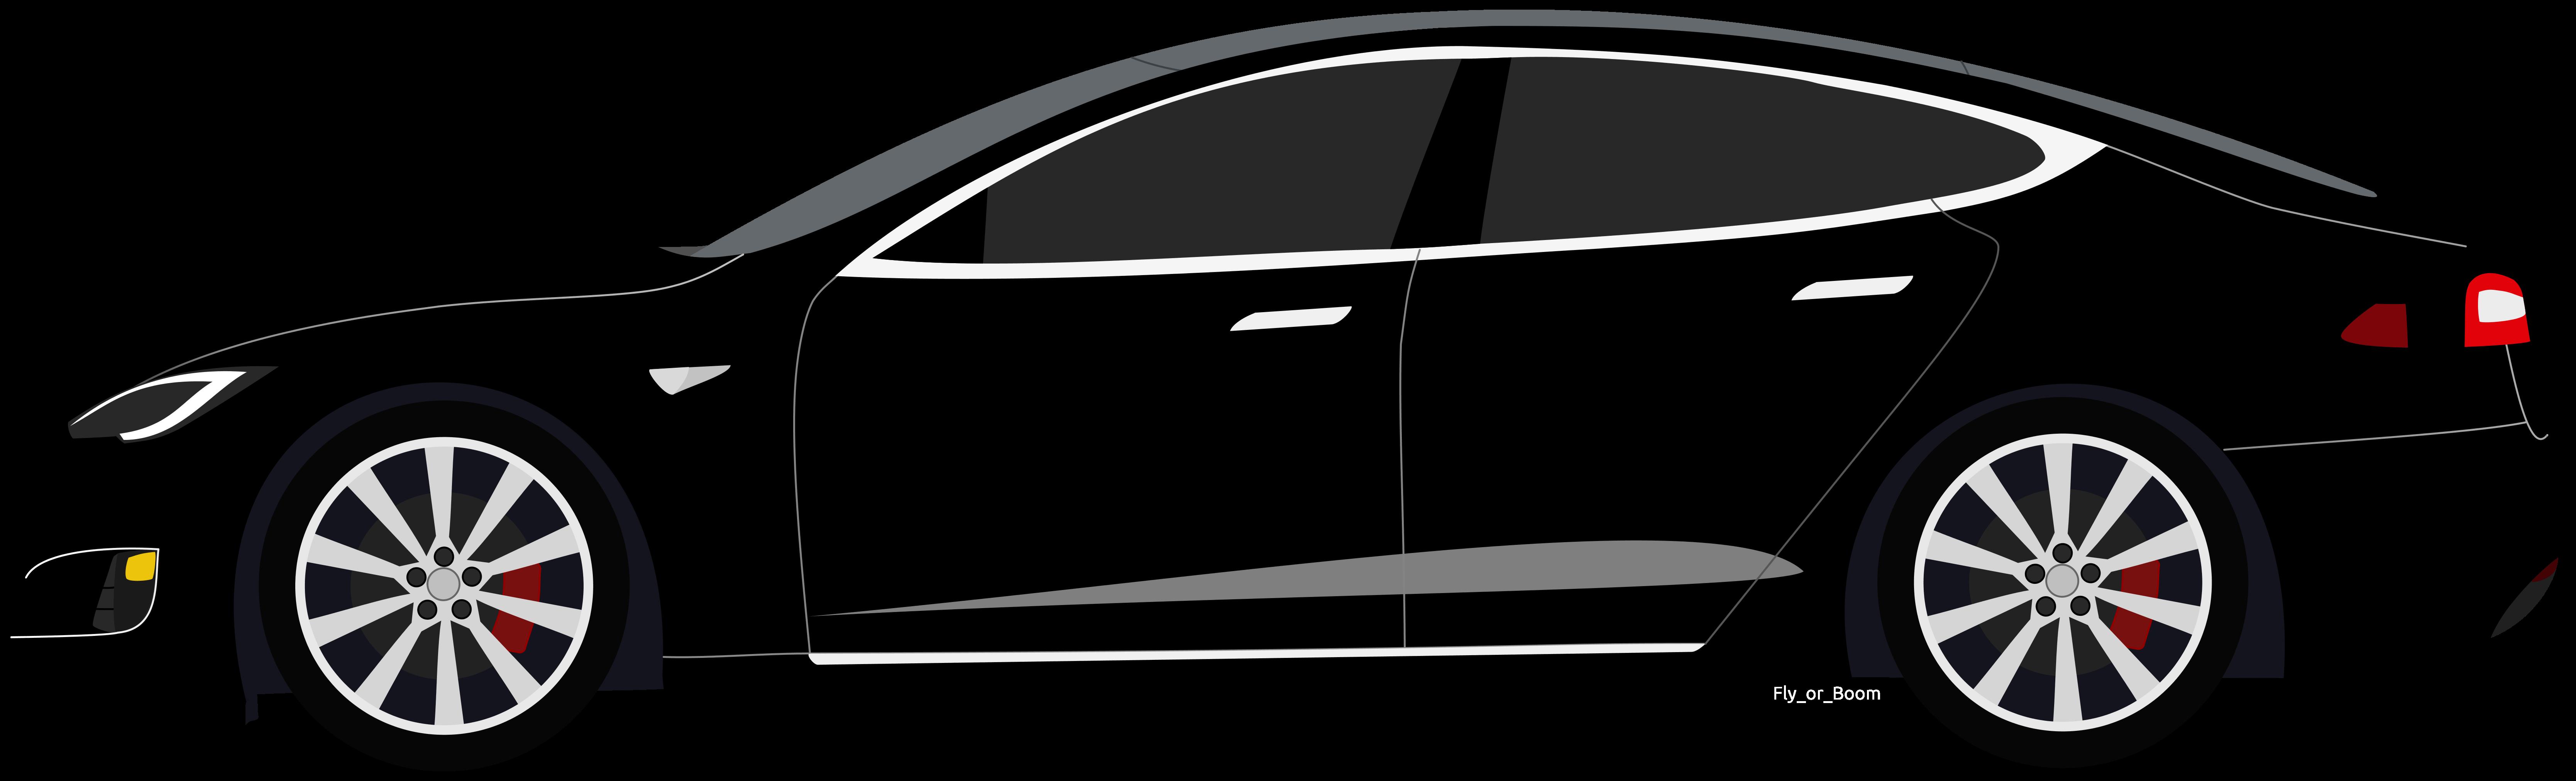 Teslas clipart freeuse stock Fan-made Tesla Cars & Supercharger Cliparts - Album on Imgur freeuse stock